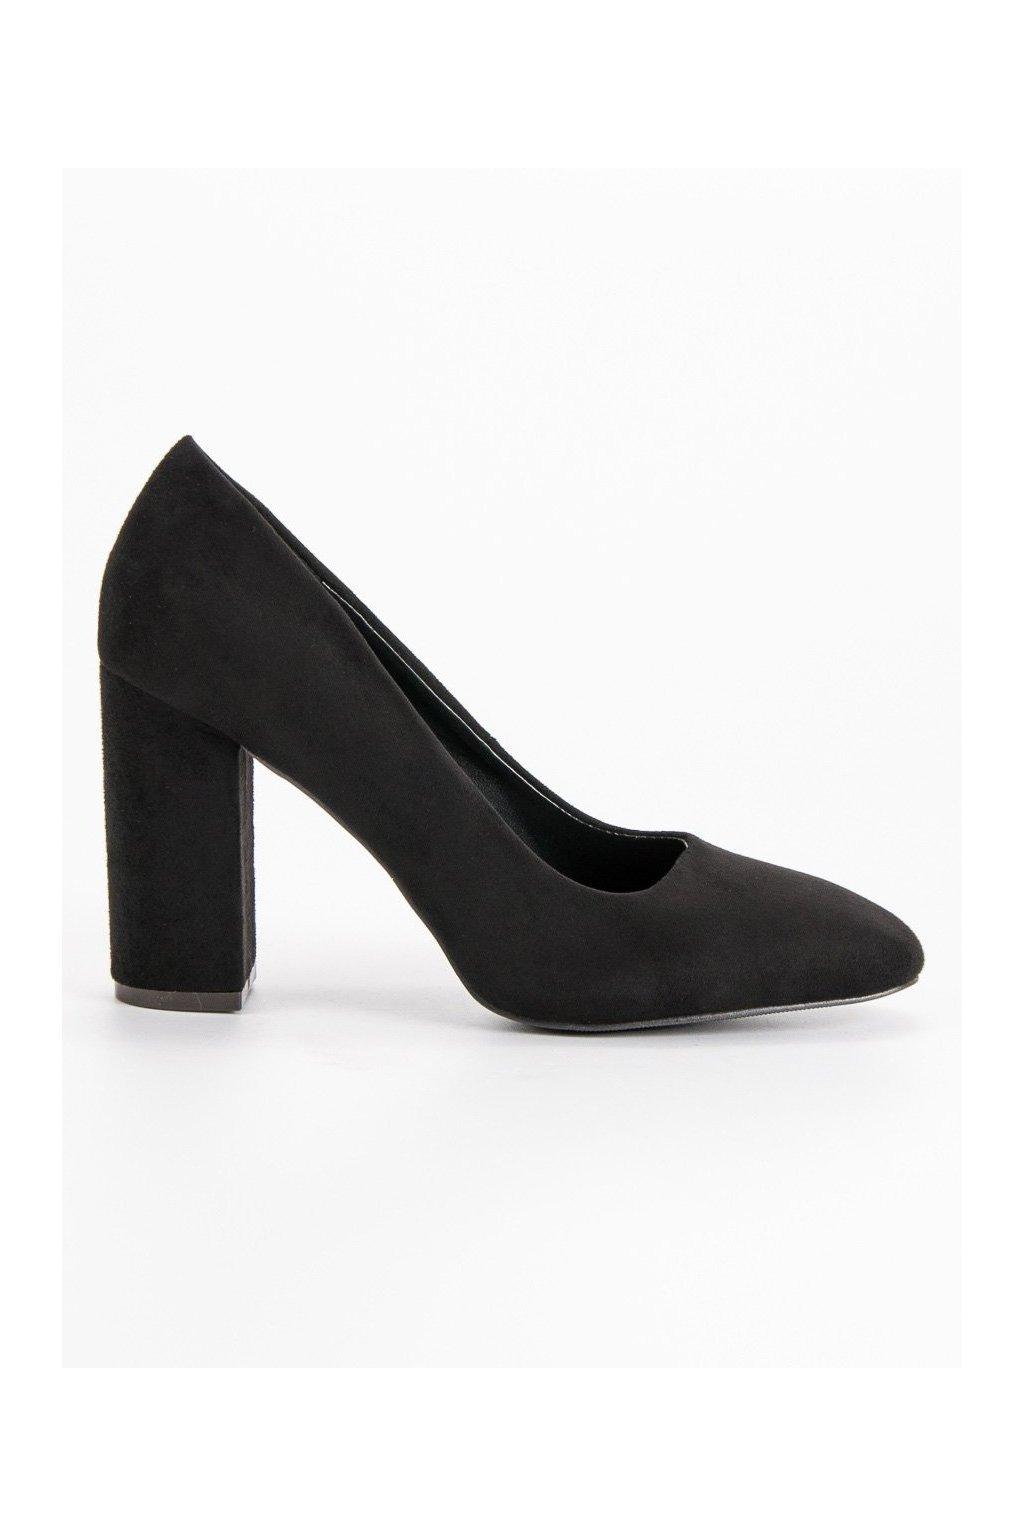 f6f132d9d5c4 1054437-2 semisove-cierne-lodicky-sweet-shoes.jpg 5c63548d